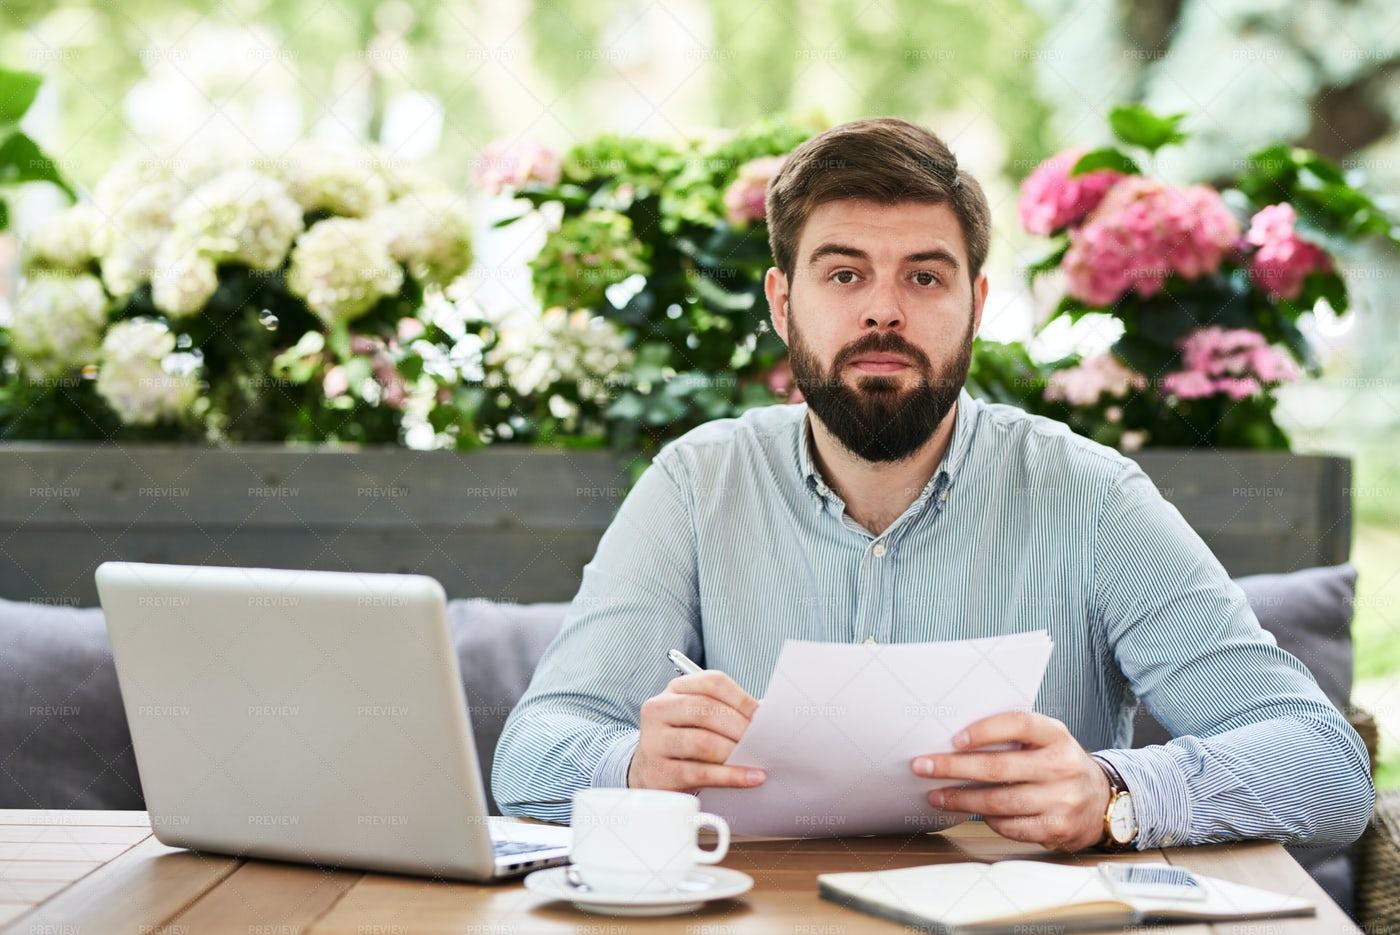 Bearded Entrepreneur Working In...: Stock Photos